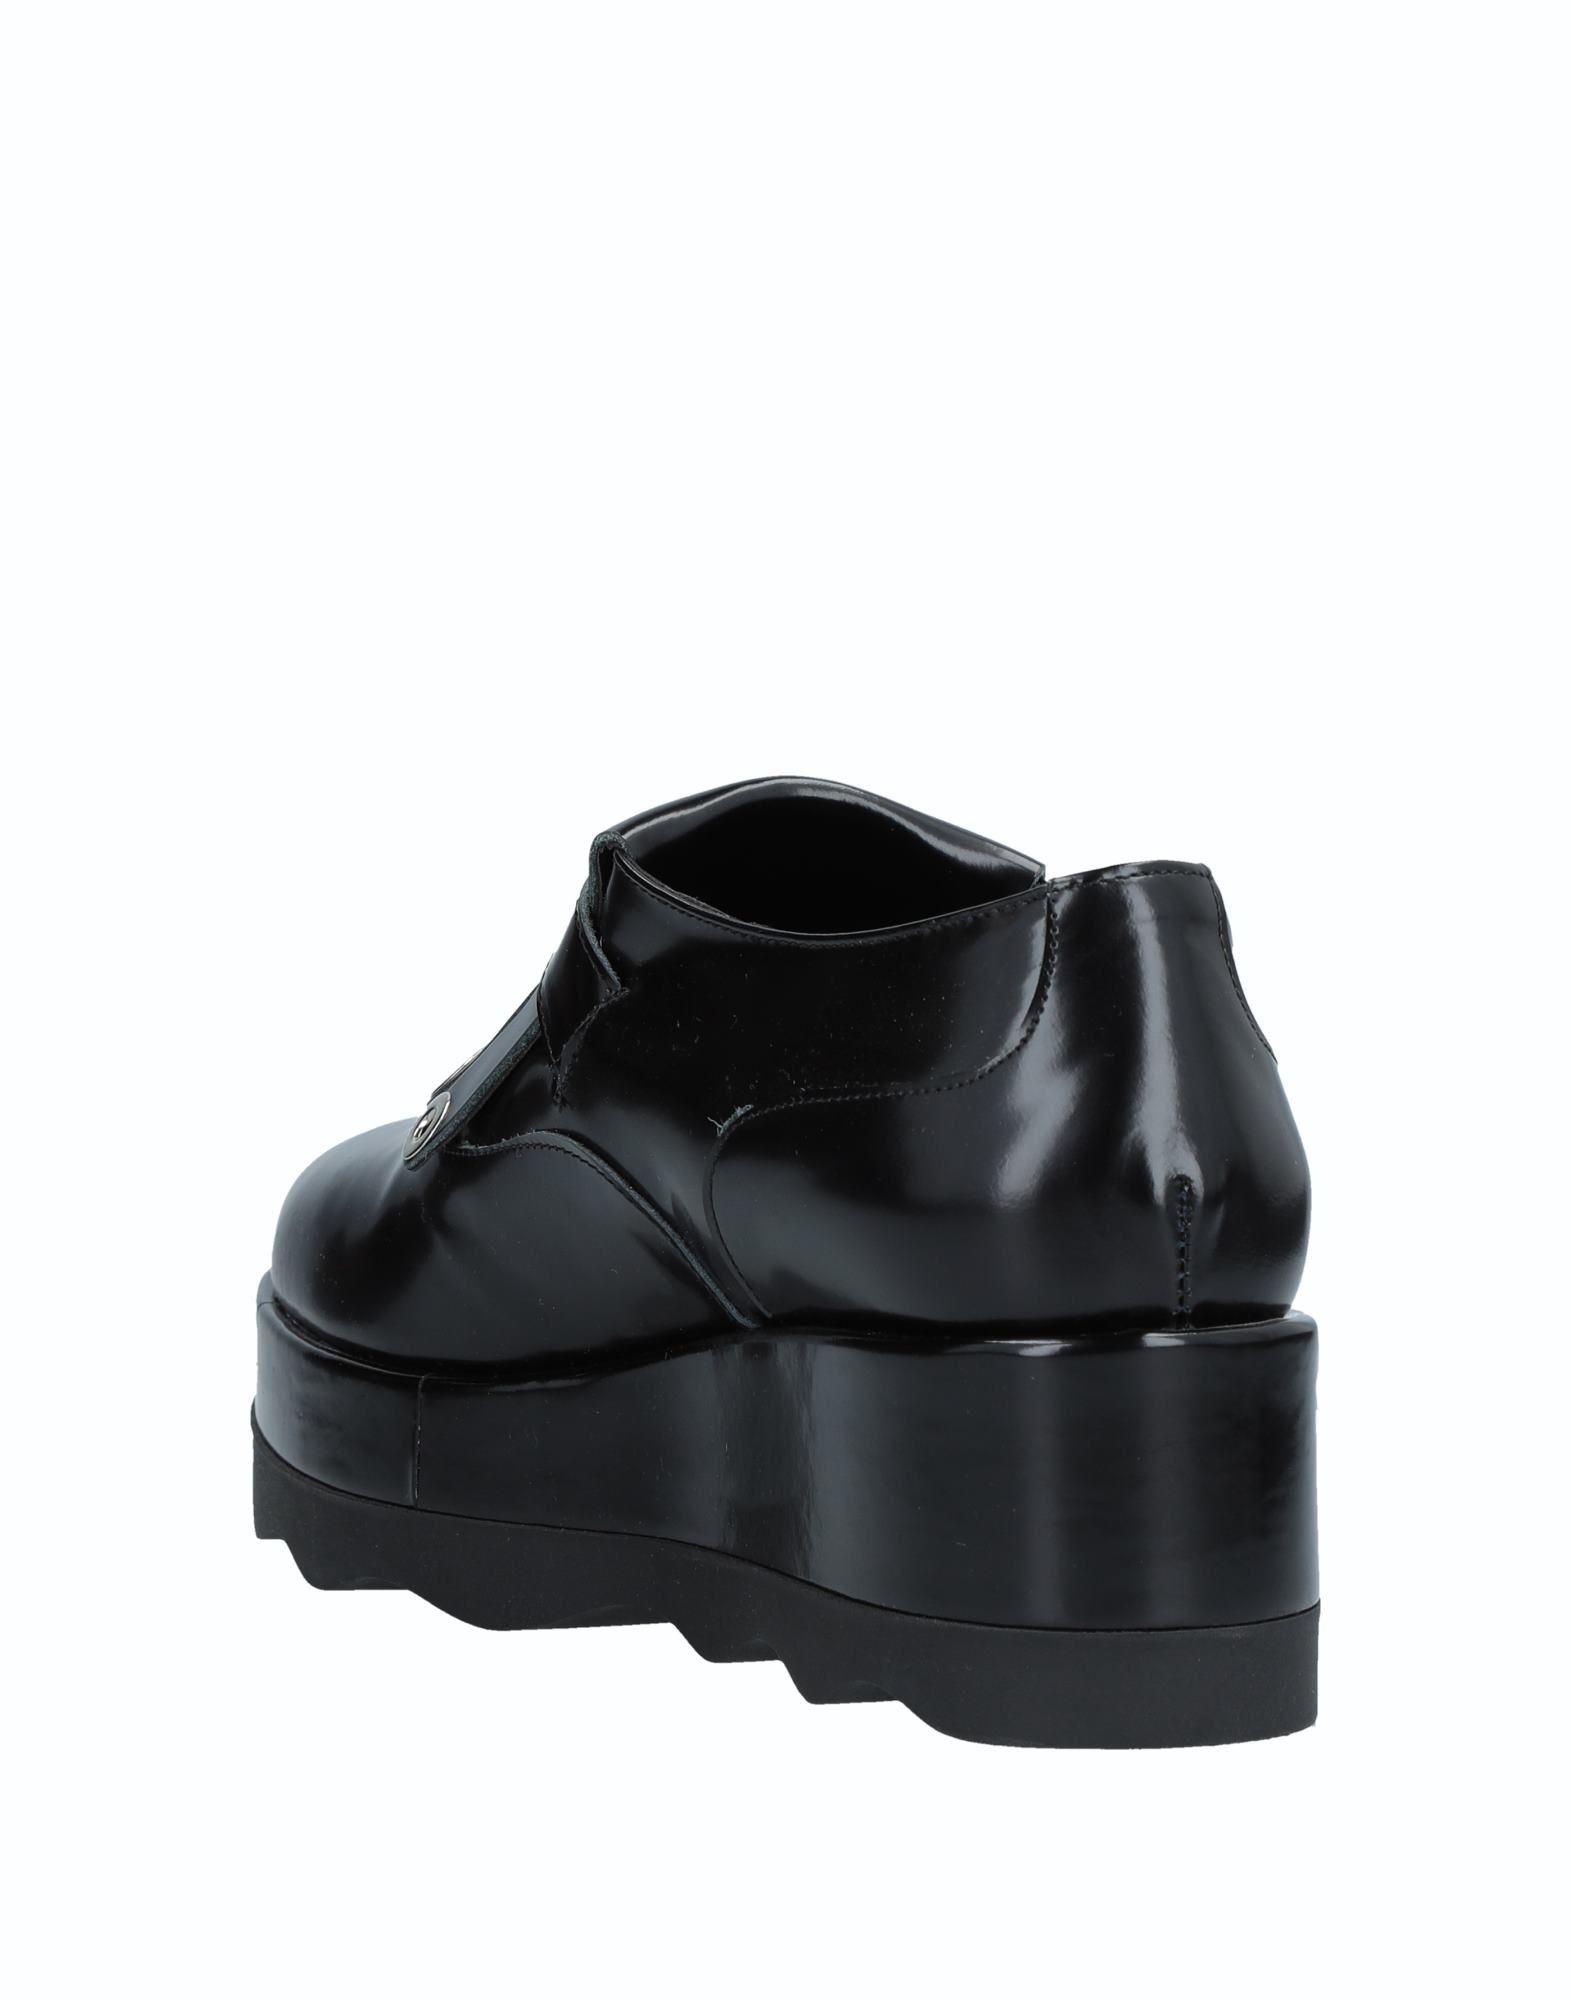 Albano Qualität Mokassins Damen  11537820RM Gute Qualität Albano beliebte Schuhe 08e72b